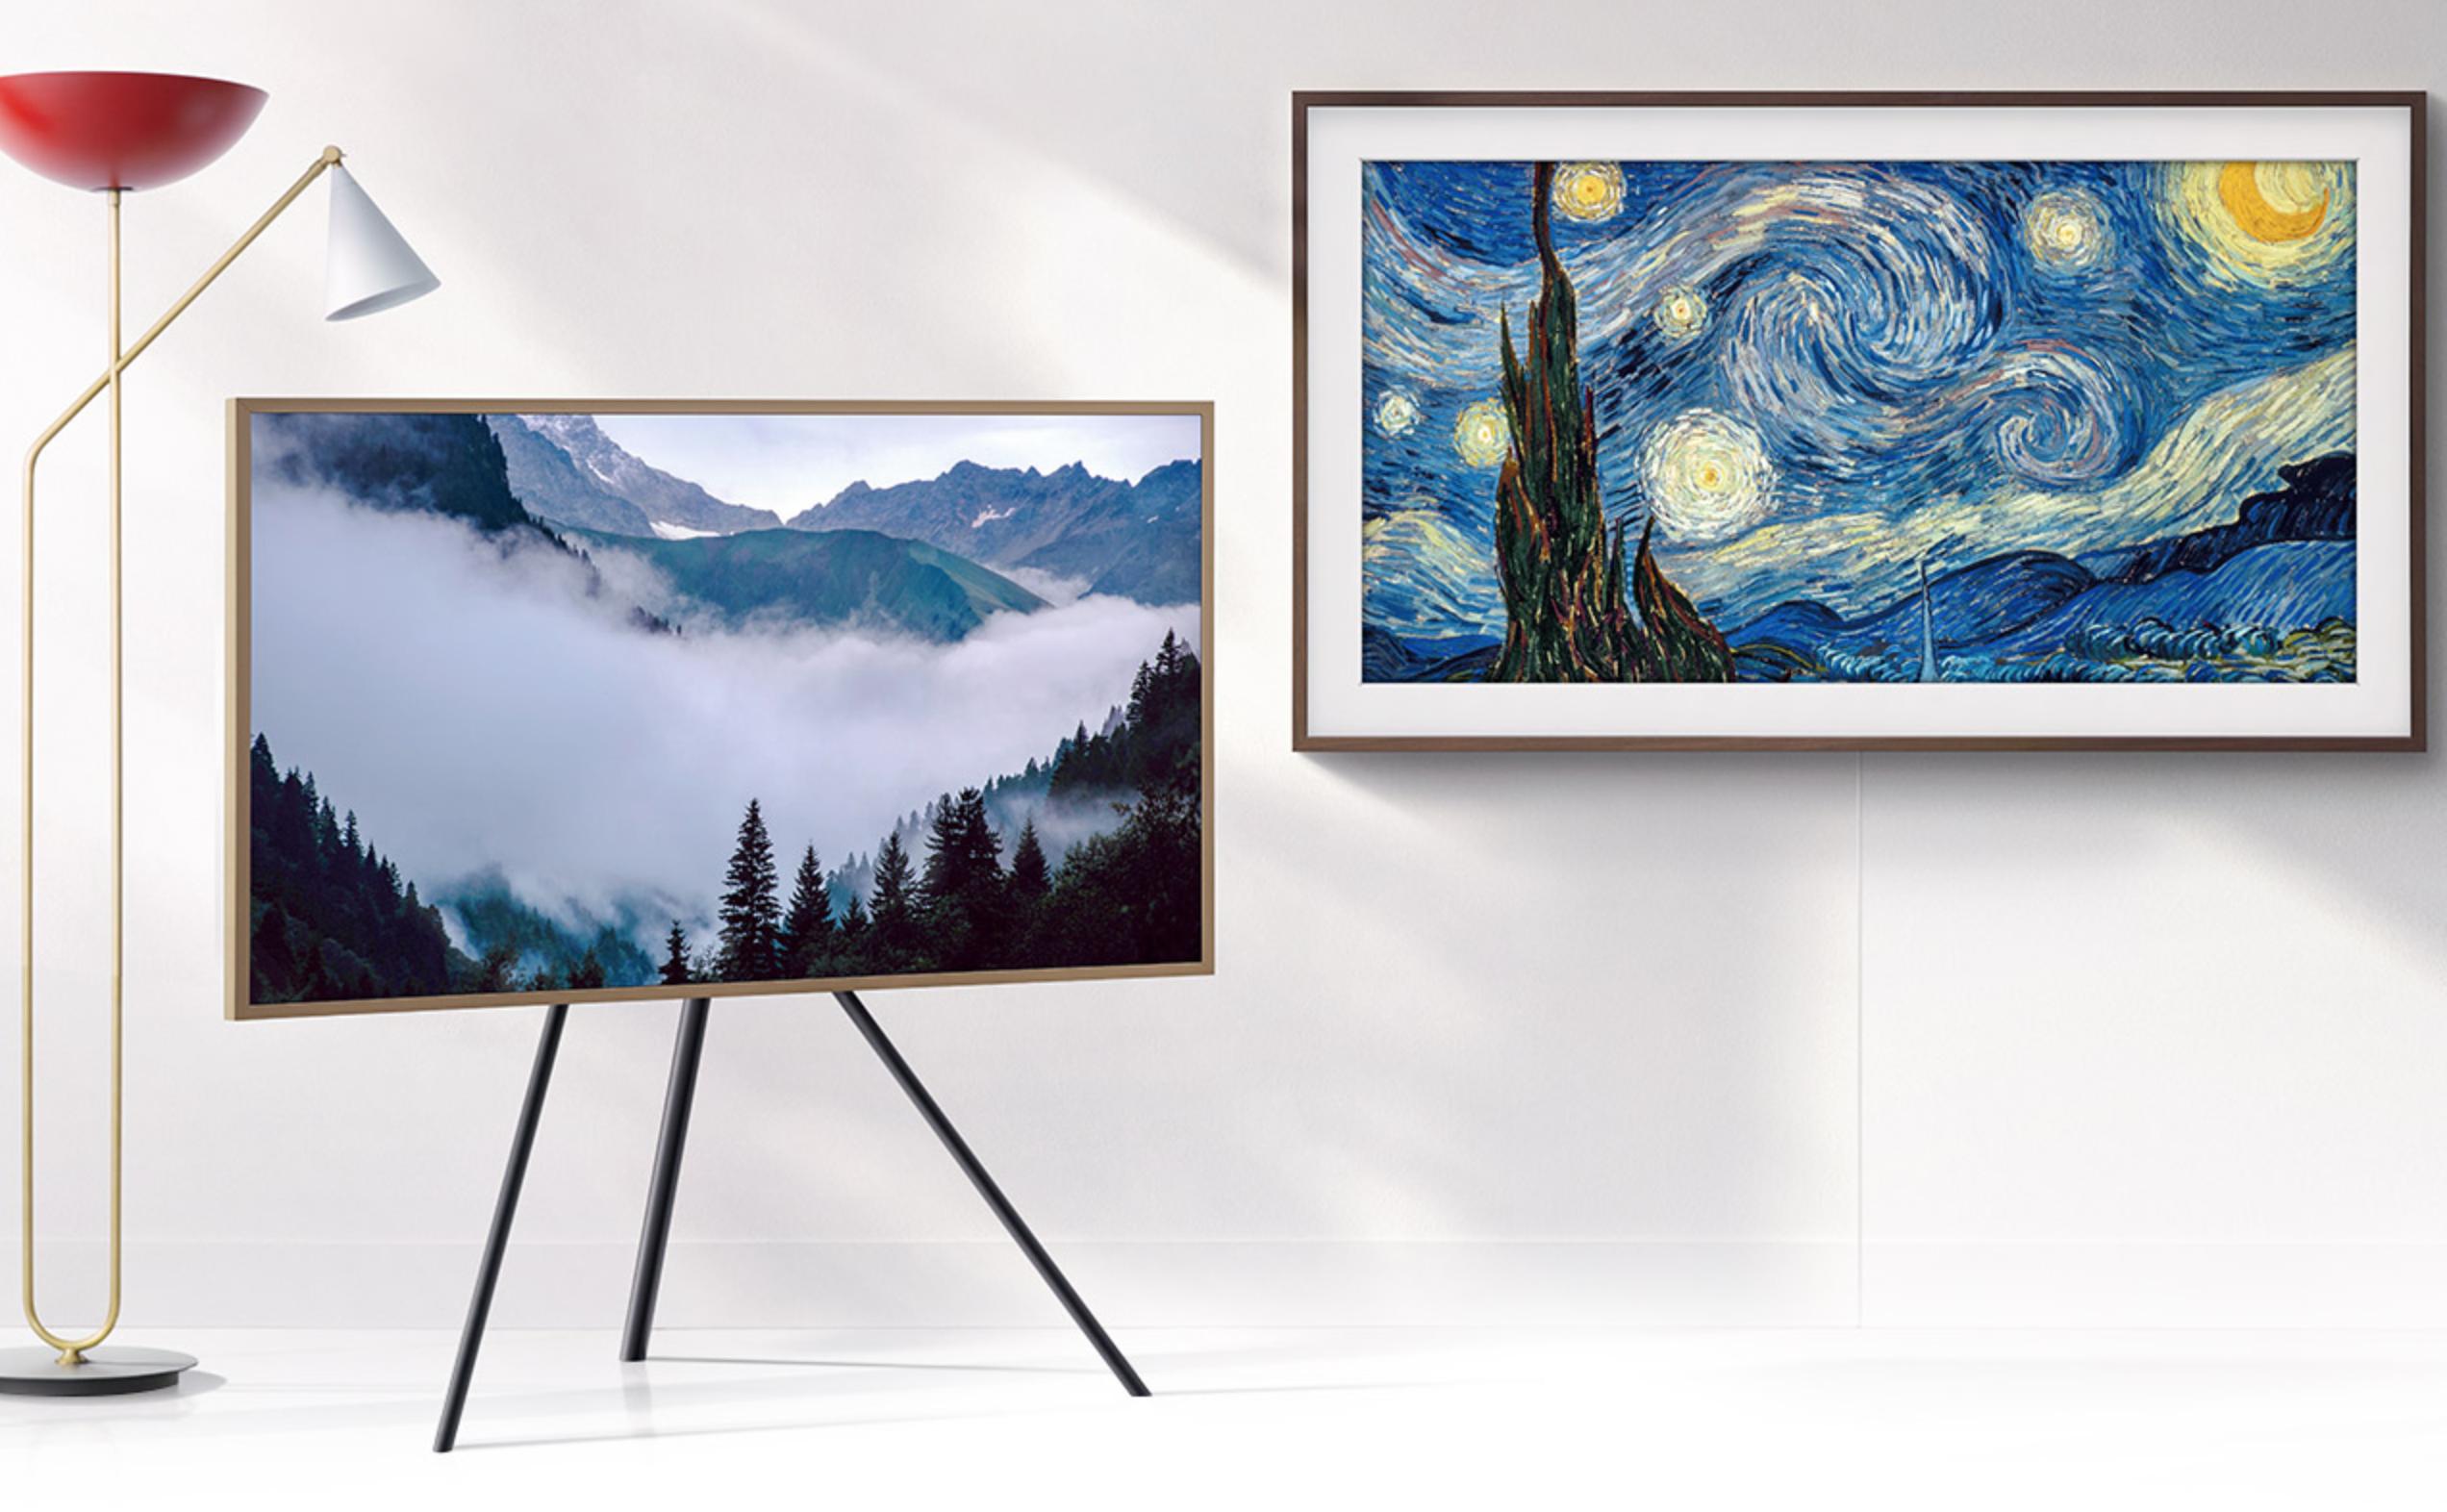 2020 Samsung Frame Tv Goes On Discount 400 Off